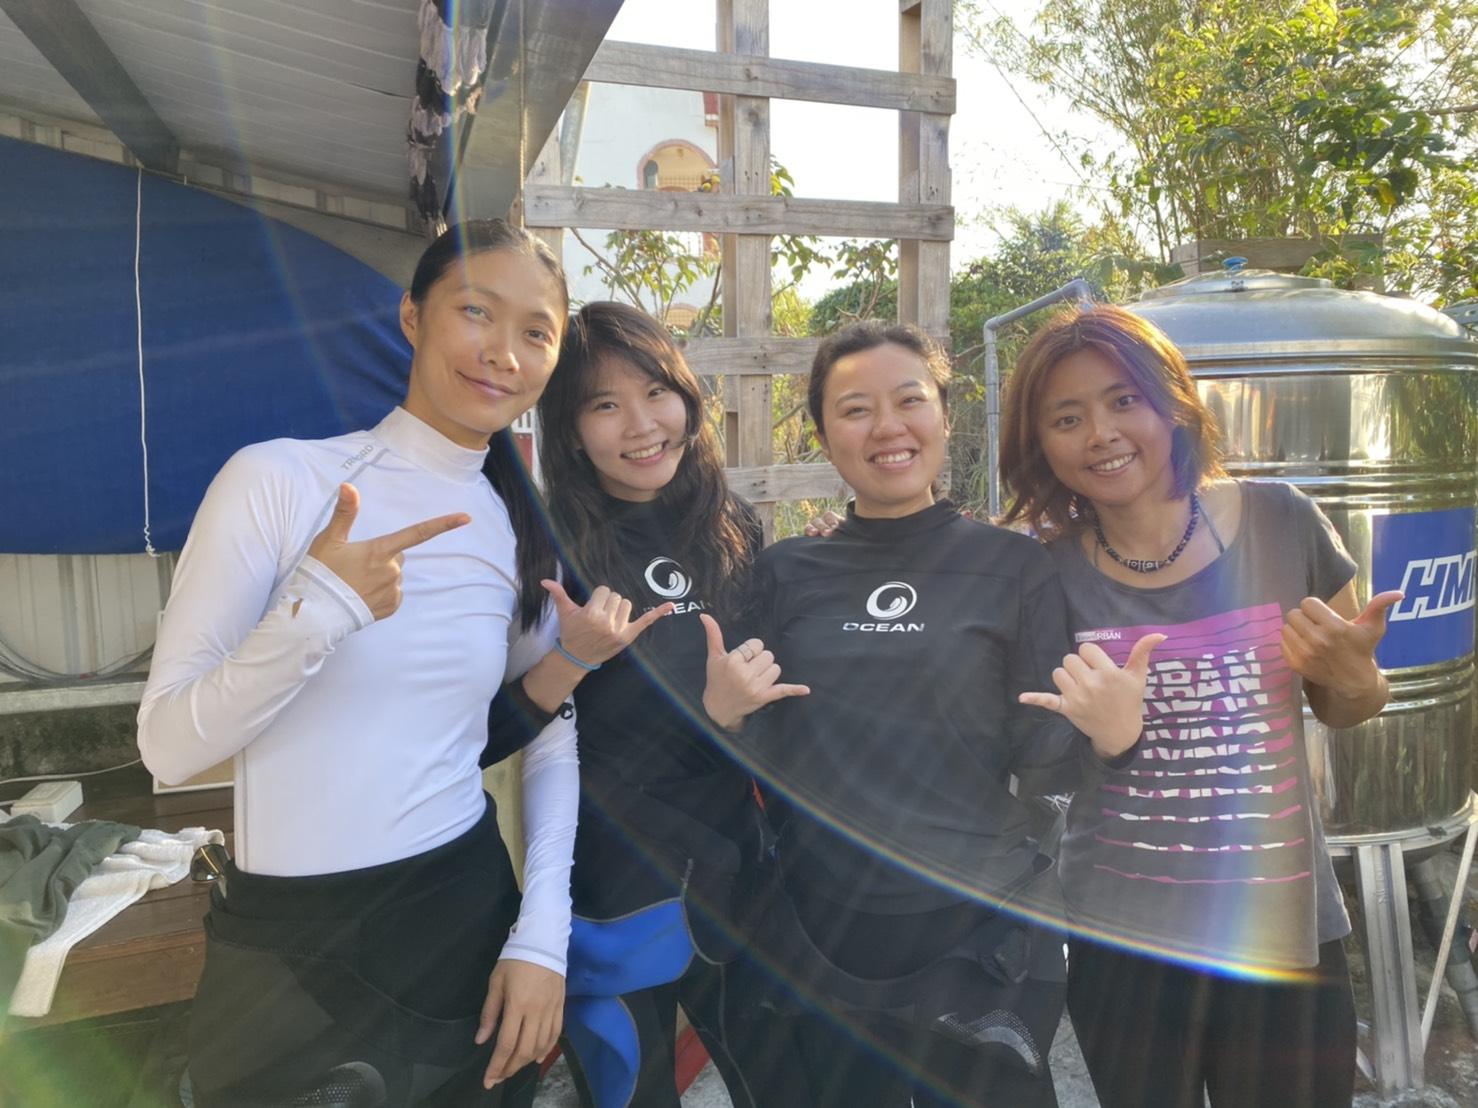 墾丁女教練 English speaking diving instructor in kenting 墾丁潛水 台灣潛水 潛水考證 墾丁船潛